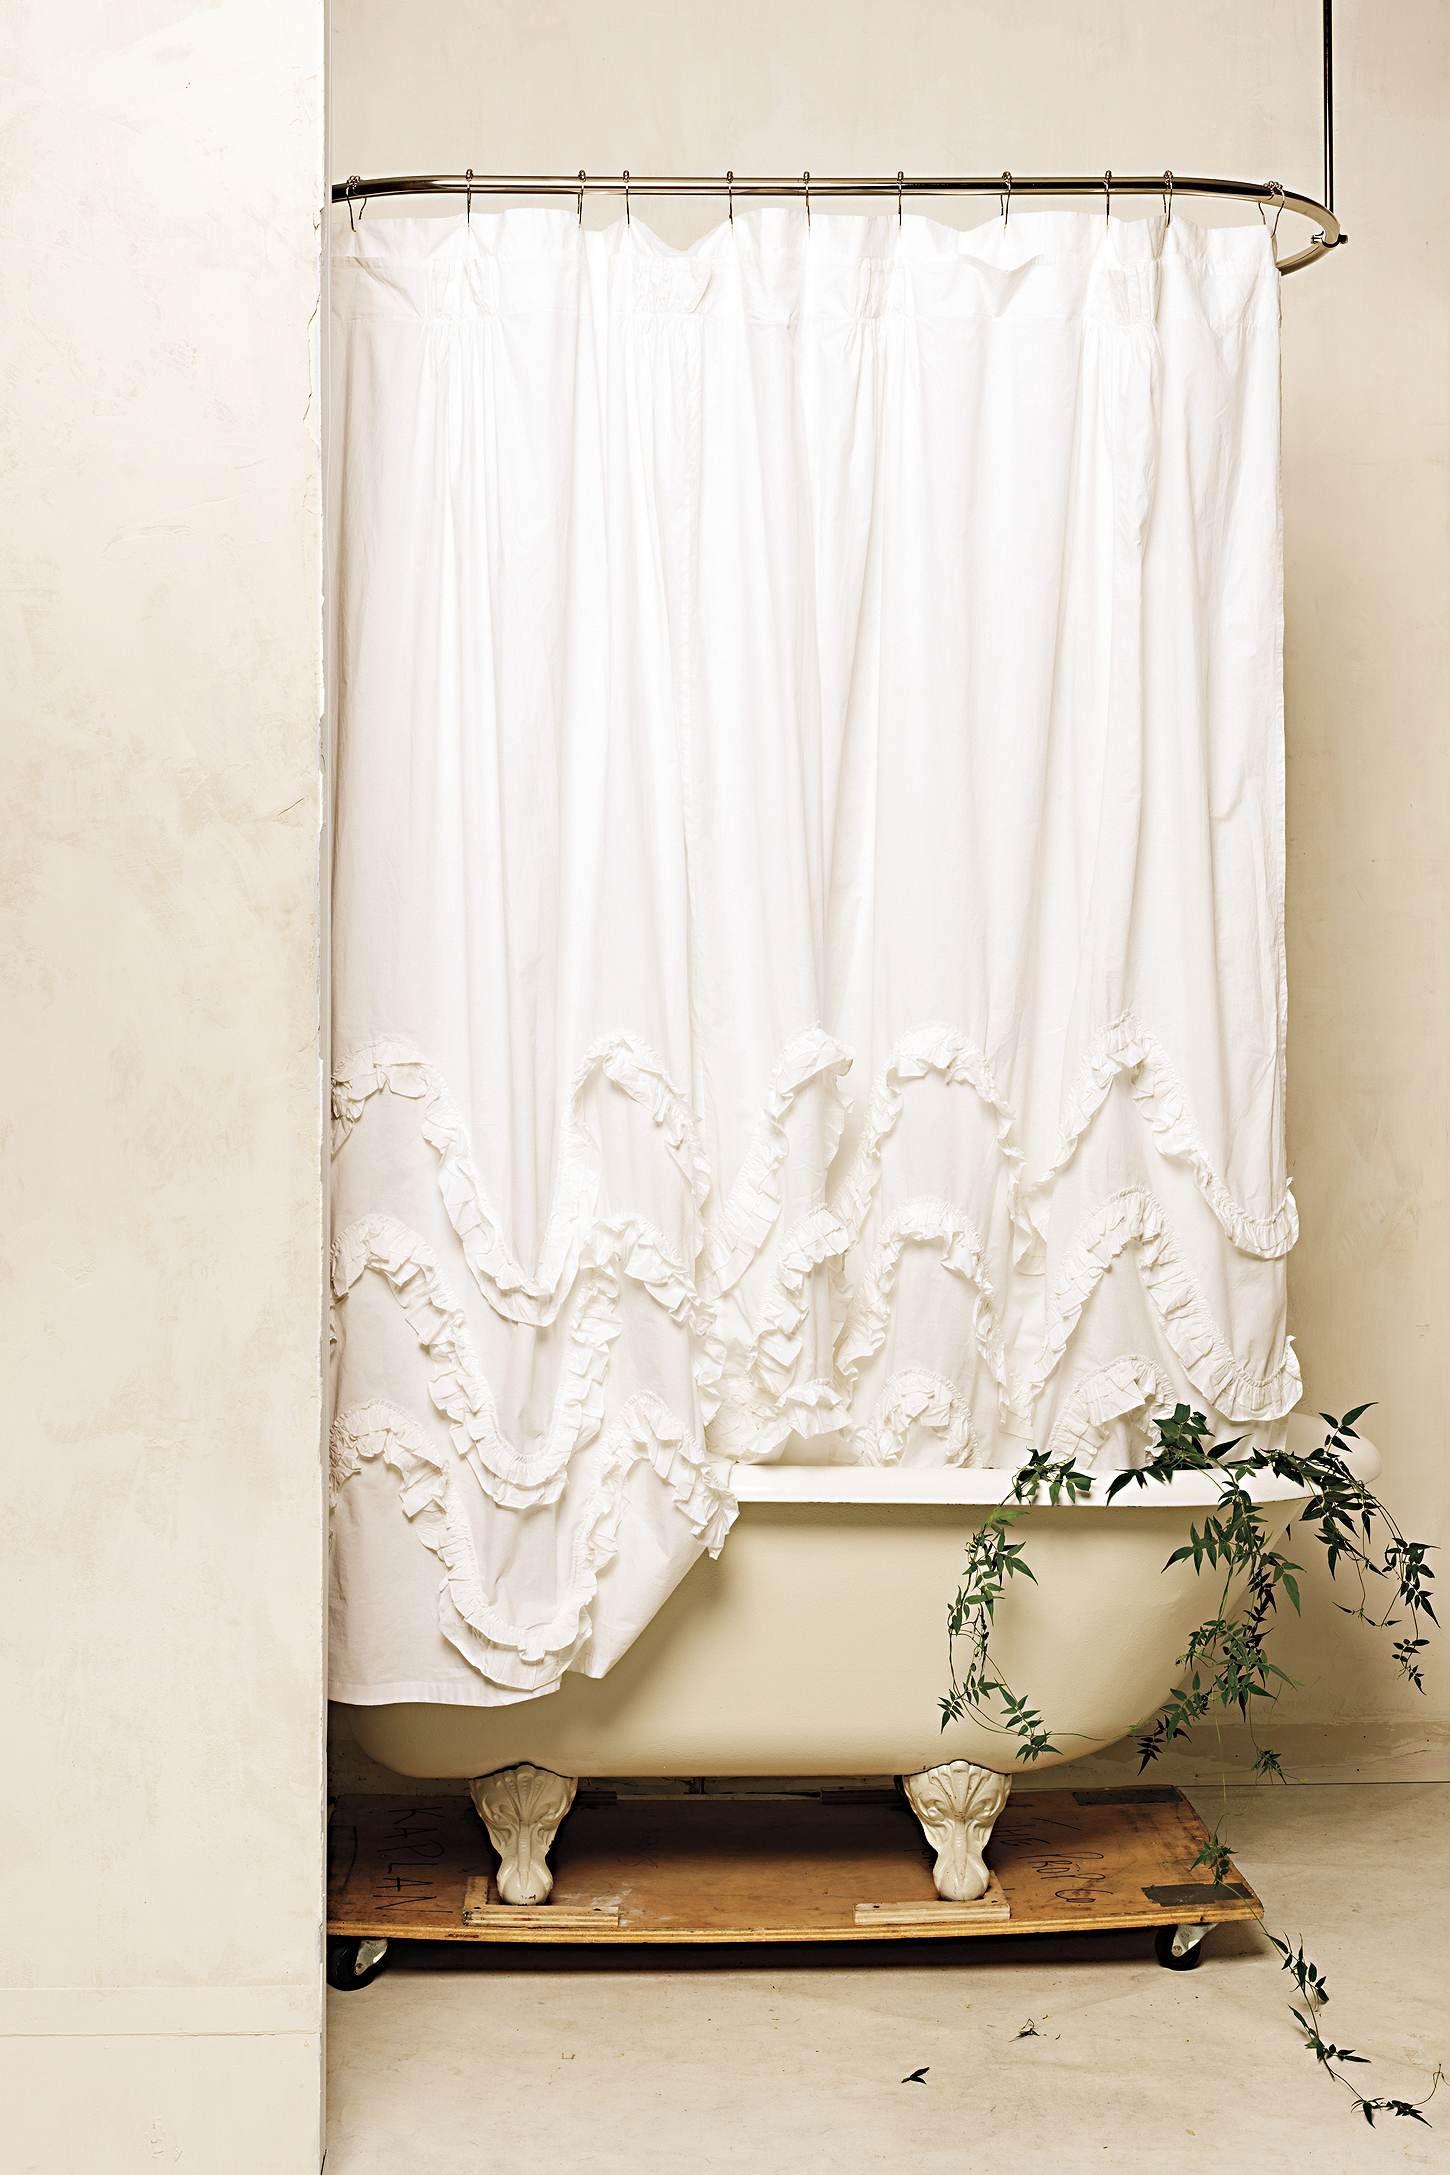 Diy ruffled shower curtain - Diy Waves Of Ruffles Shower Curtain Tutorial Several Really Neat Ruffled Curtain Ideas